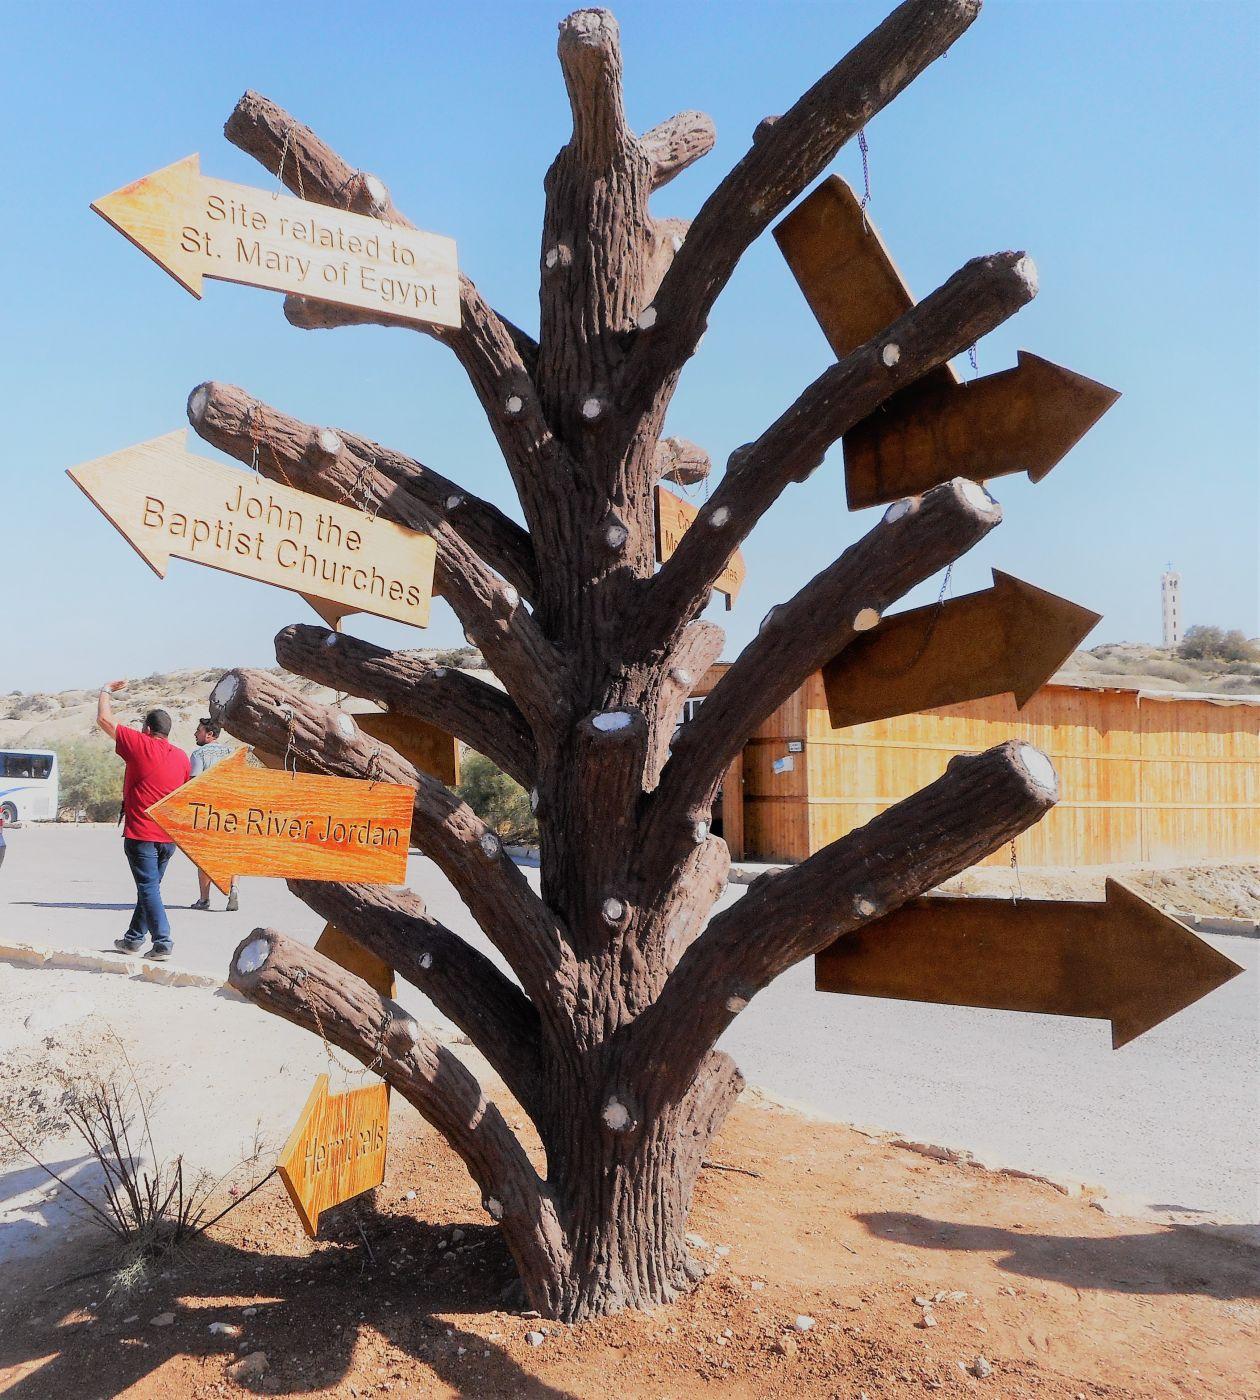 Path to the Jordan River, Israel